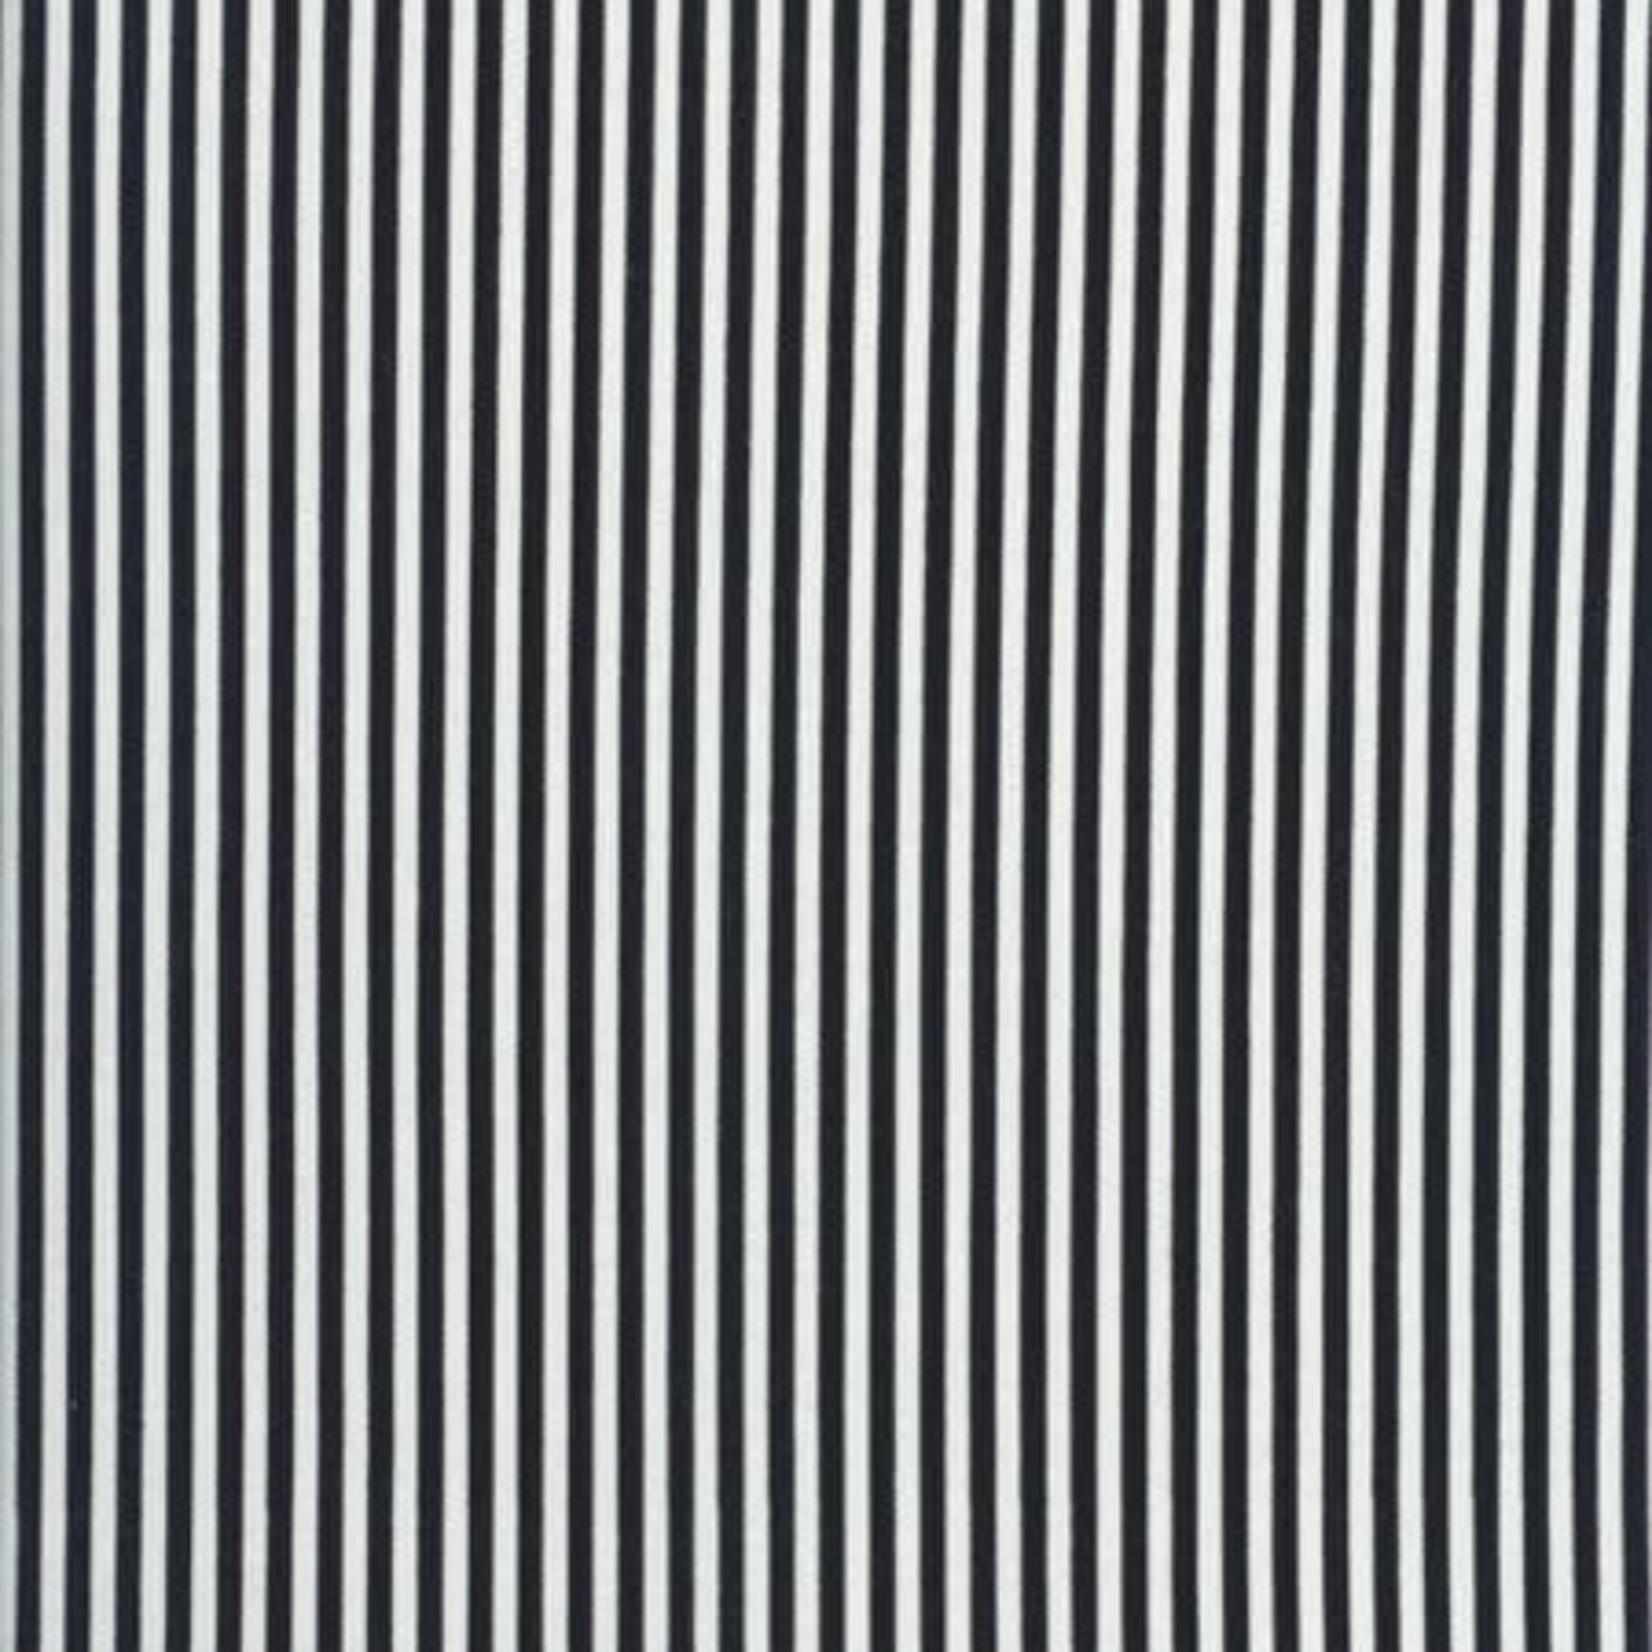 "TIMELESS TREASURES Stripe 1/8"" Black/White C8109 PER CM OR $20/M"